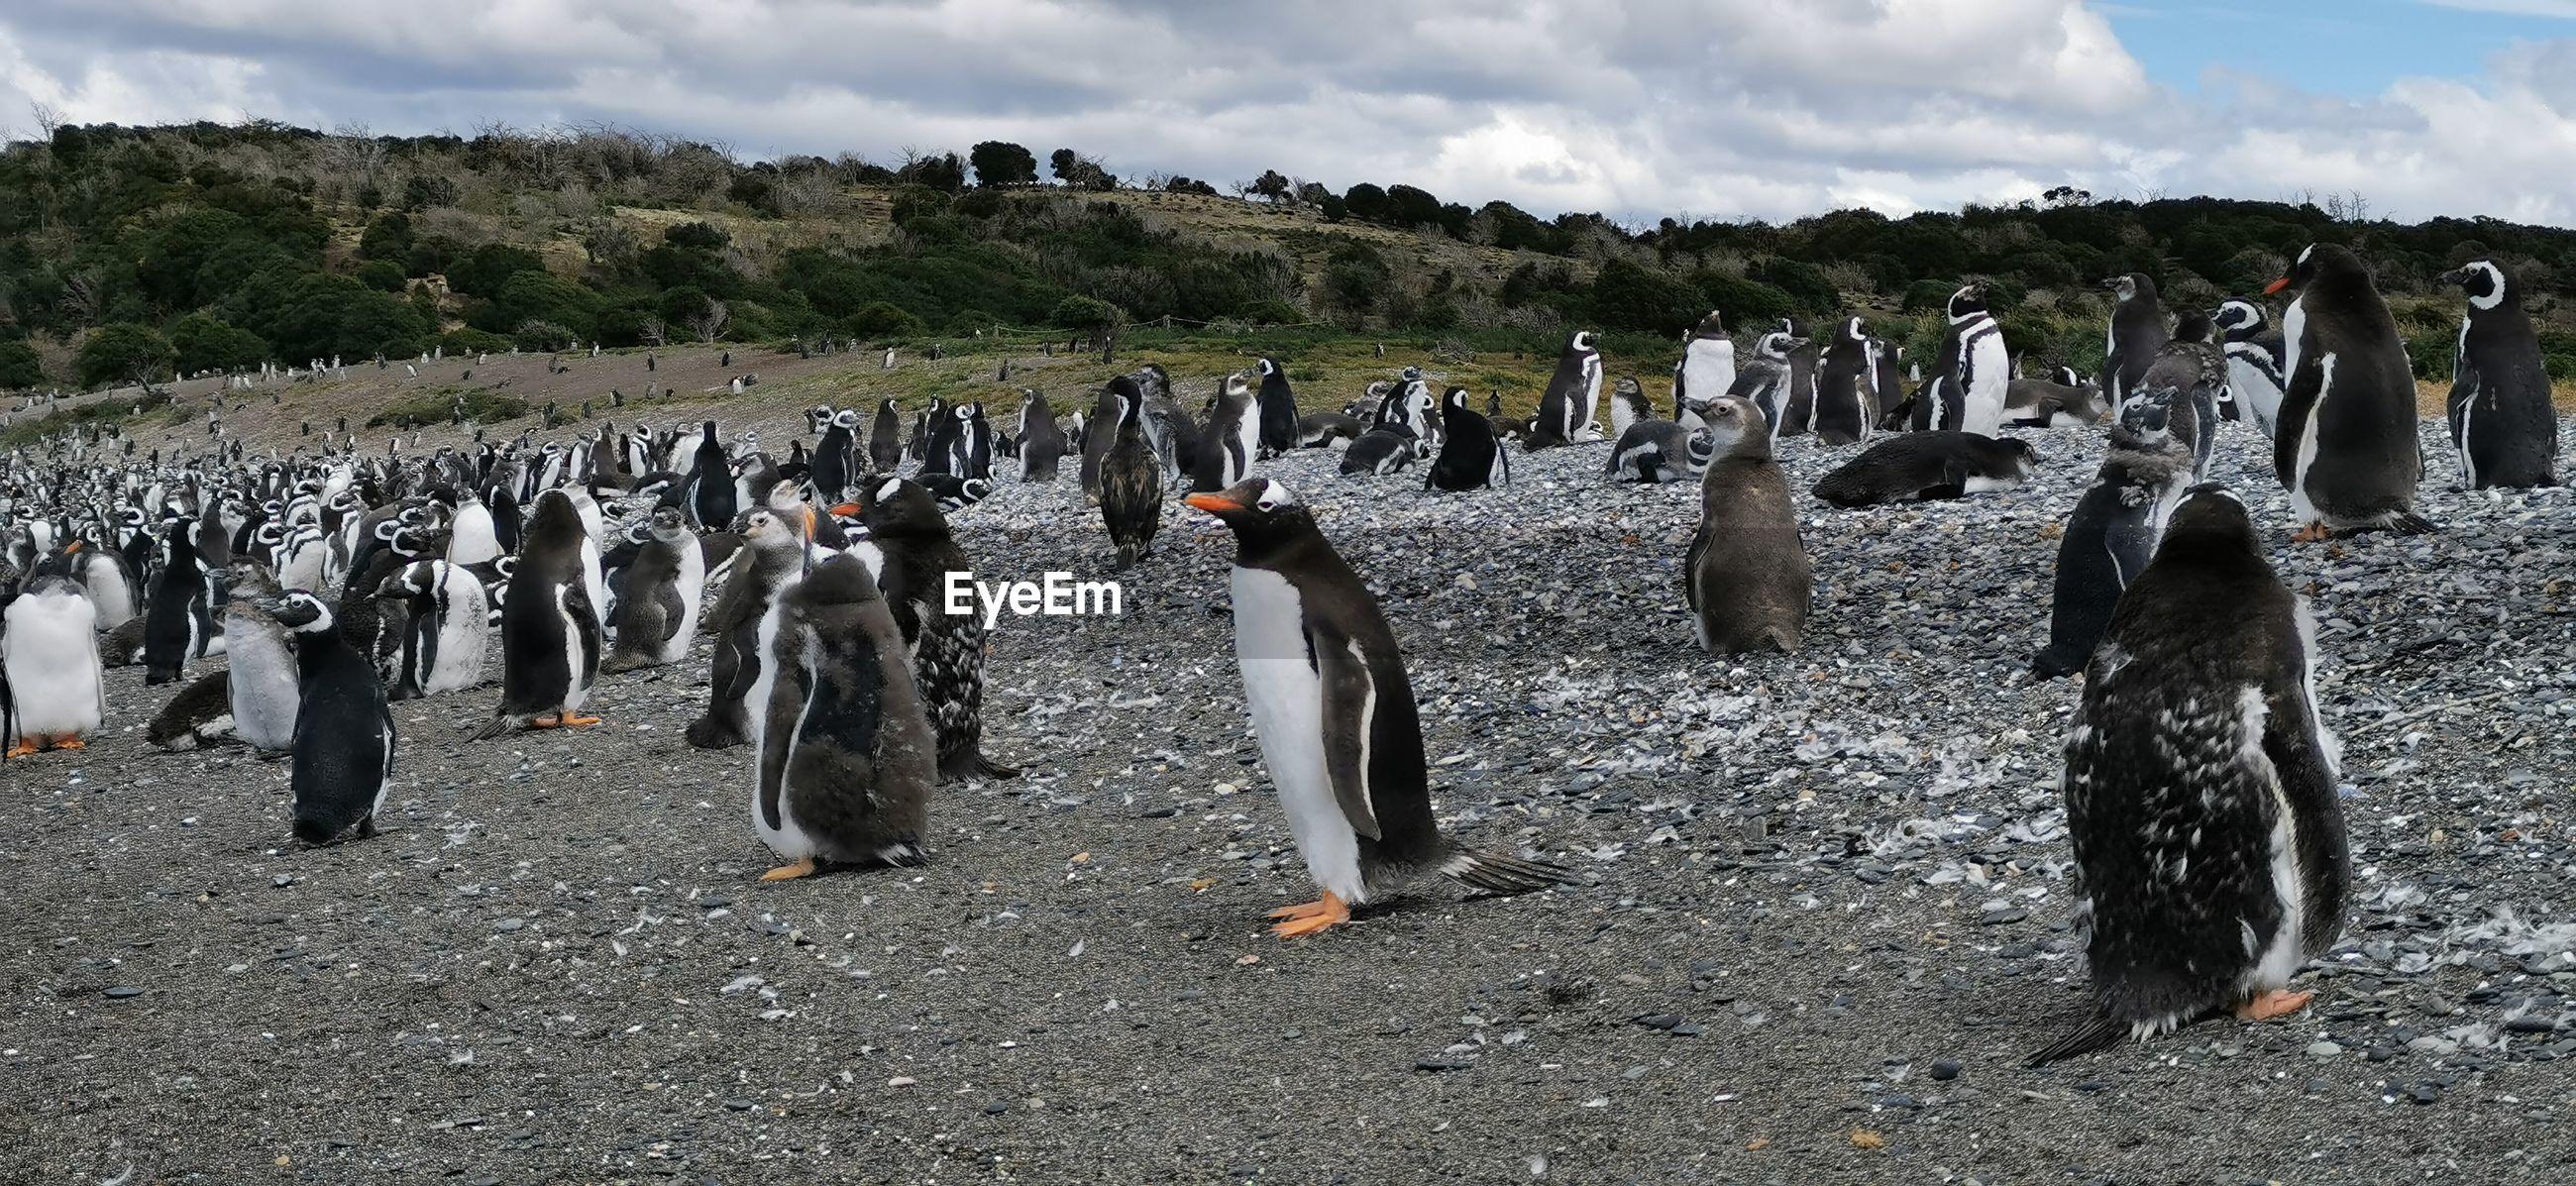 Penguins in ushuaia, patagonia argentina